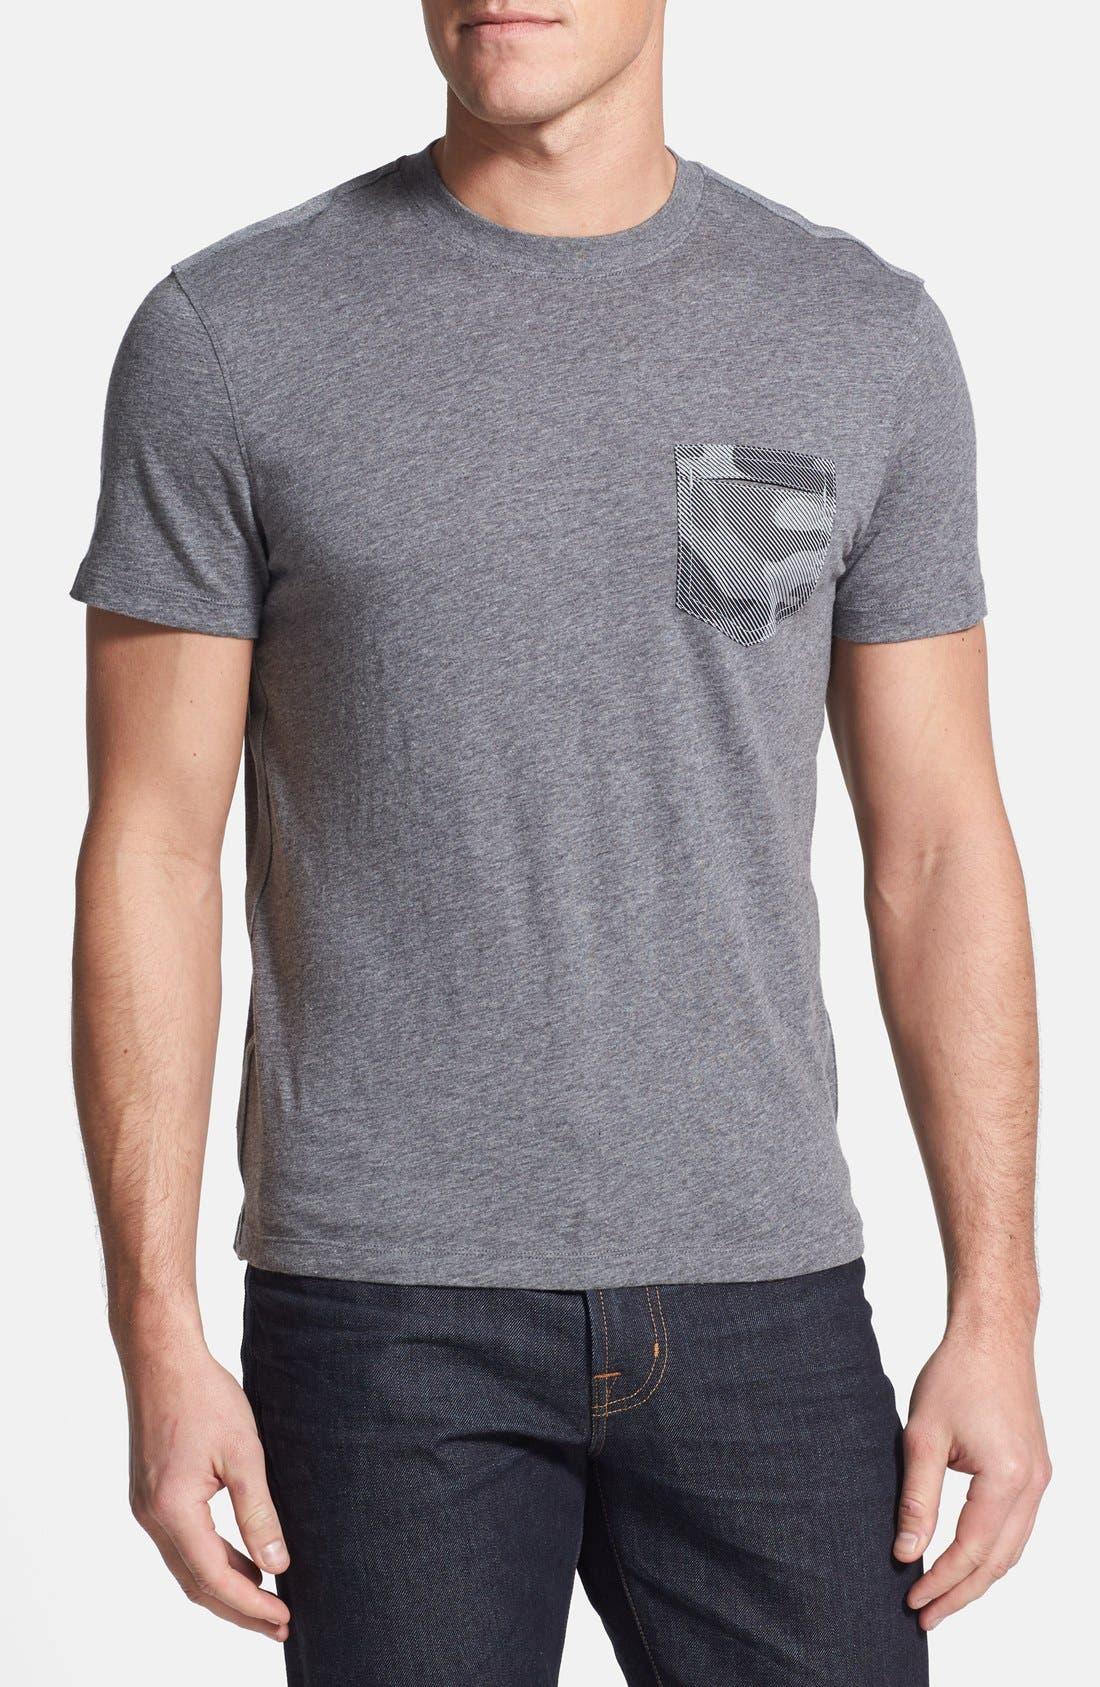 Main Image - Michael Kors Camo Pocket Slub T-Shirt